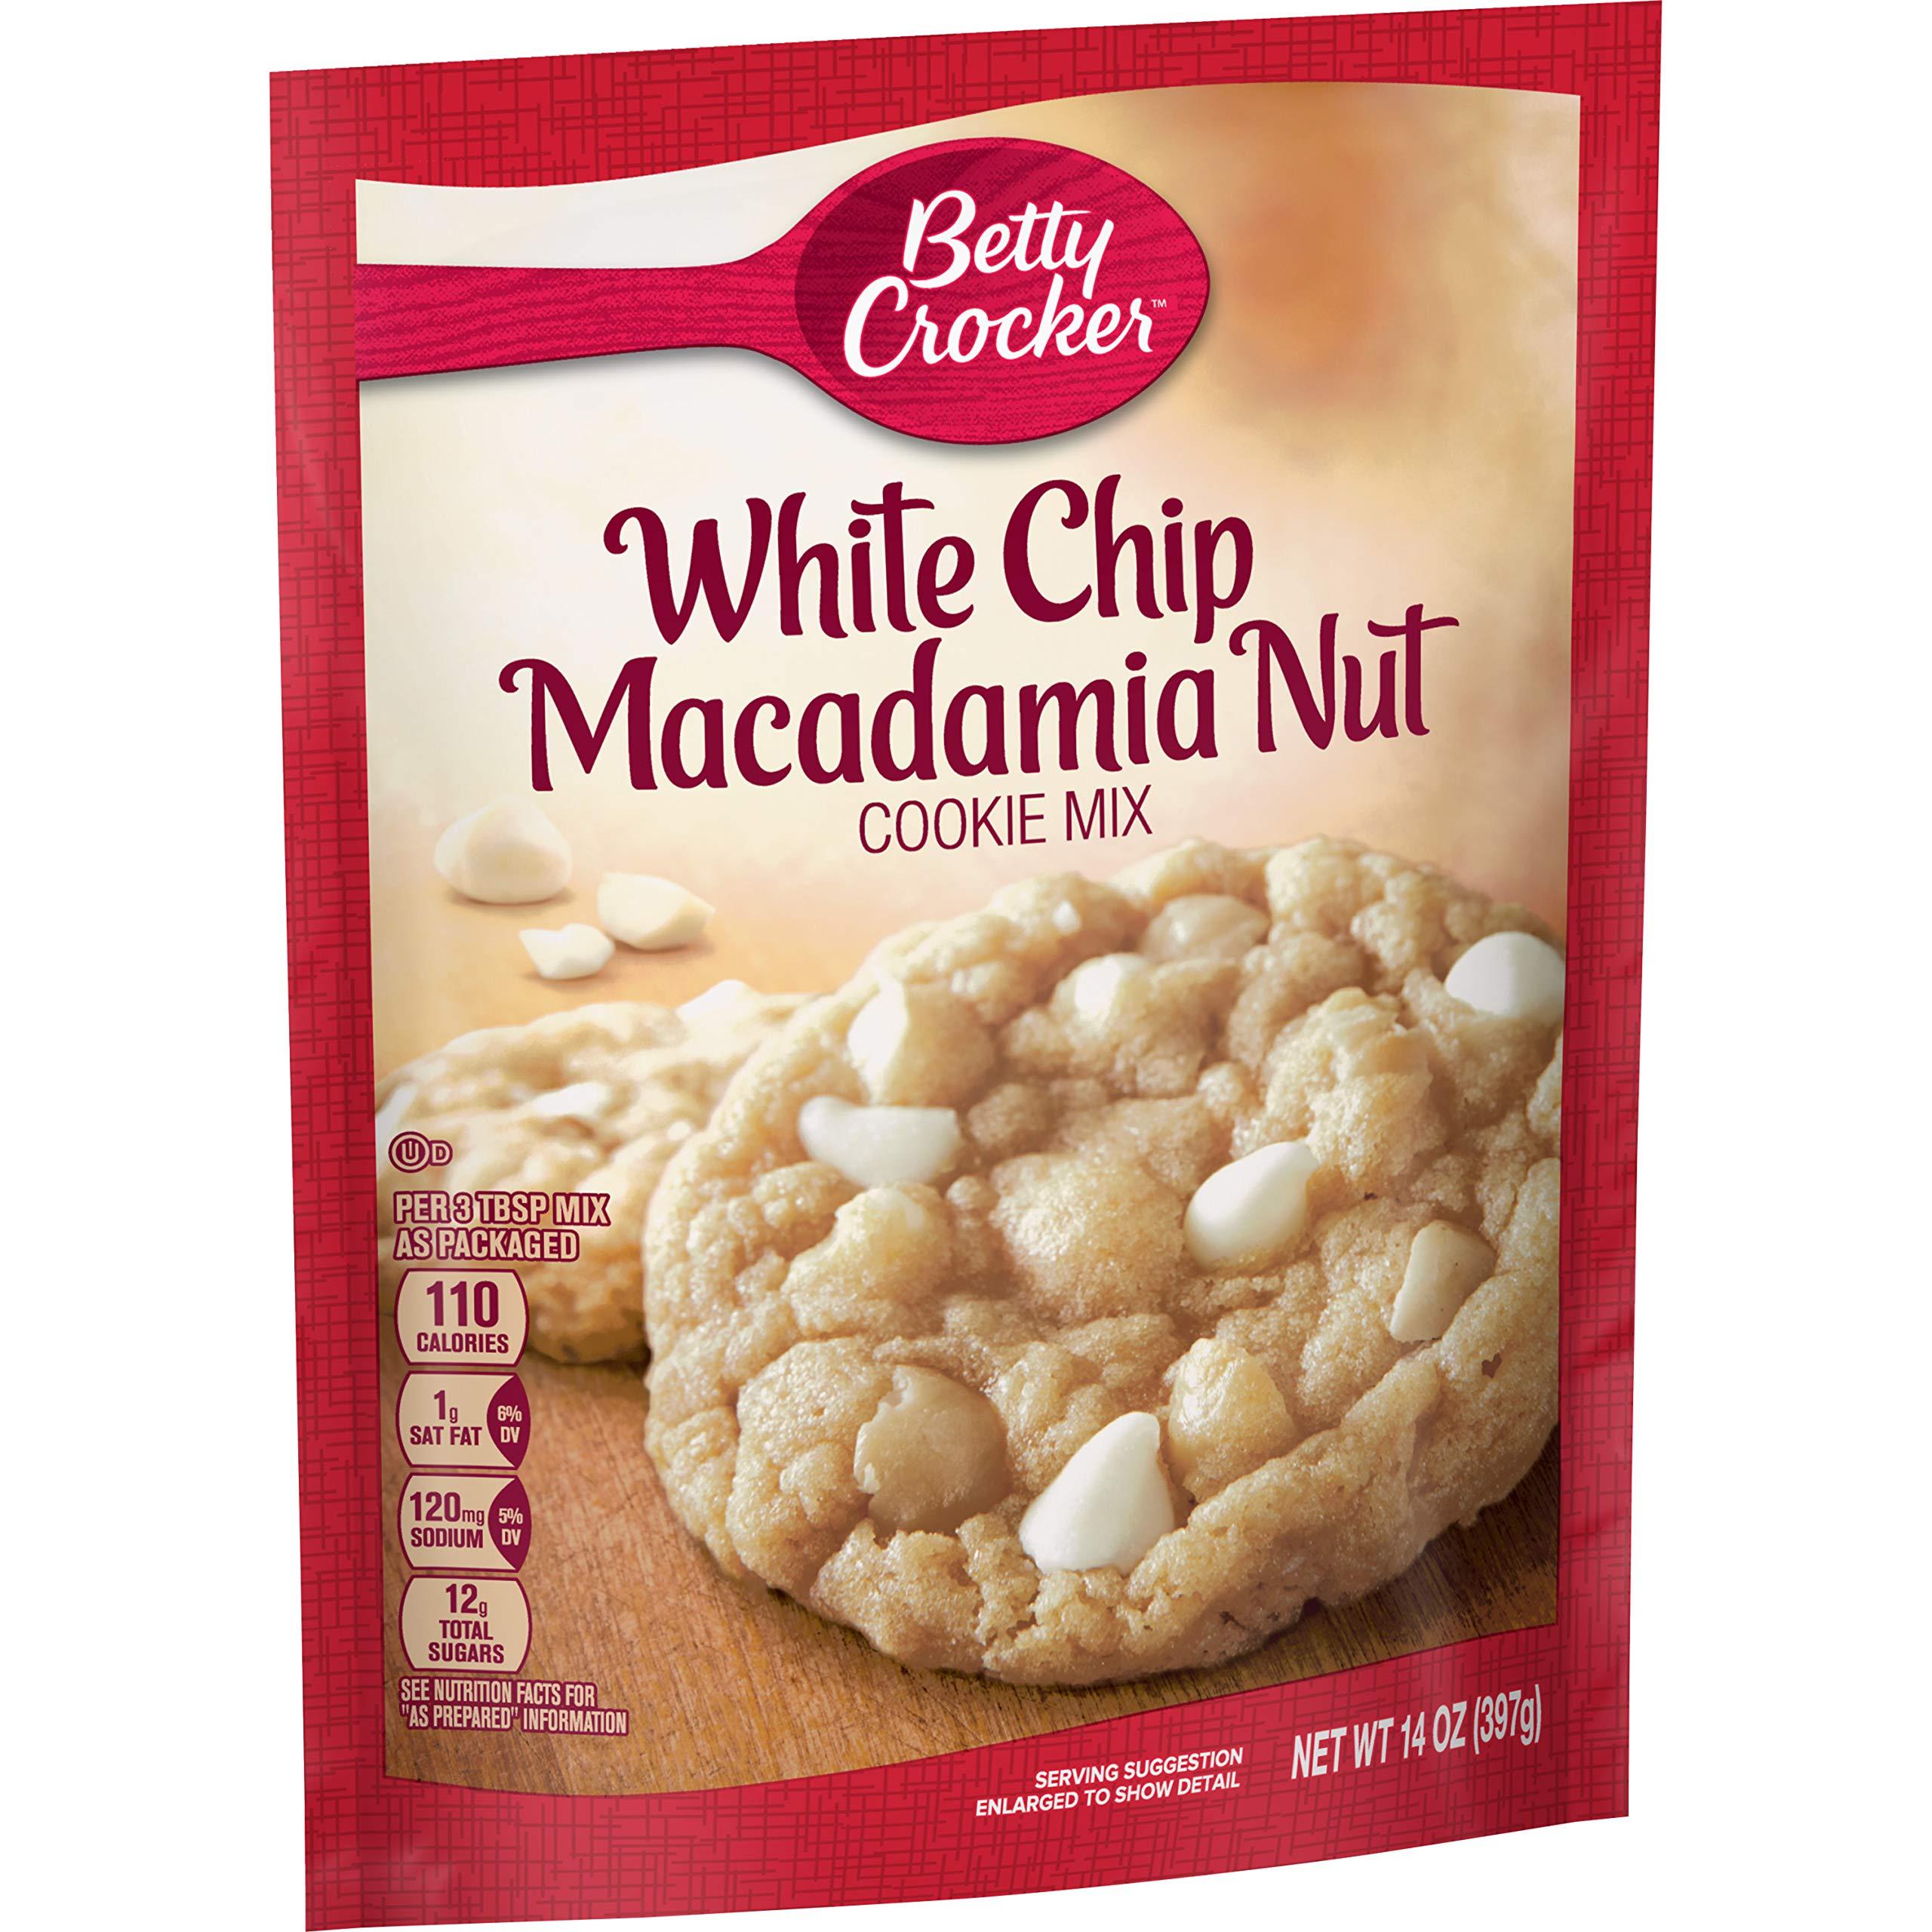 Betty Crocker Cookie Mix White Chip Macadamia Nut 14.0 oz Pouch